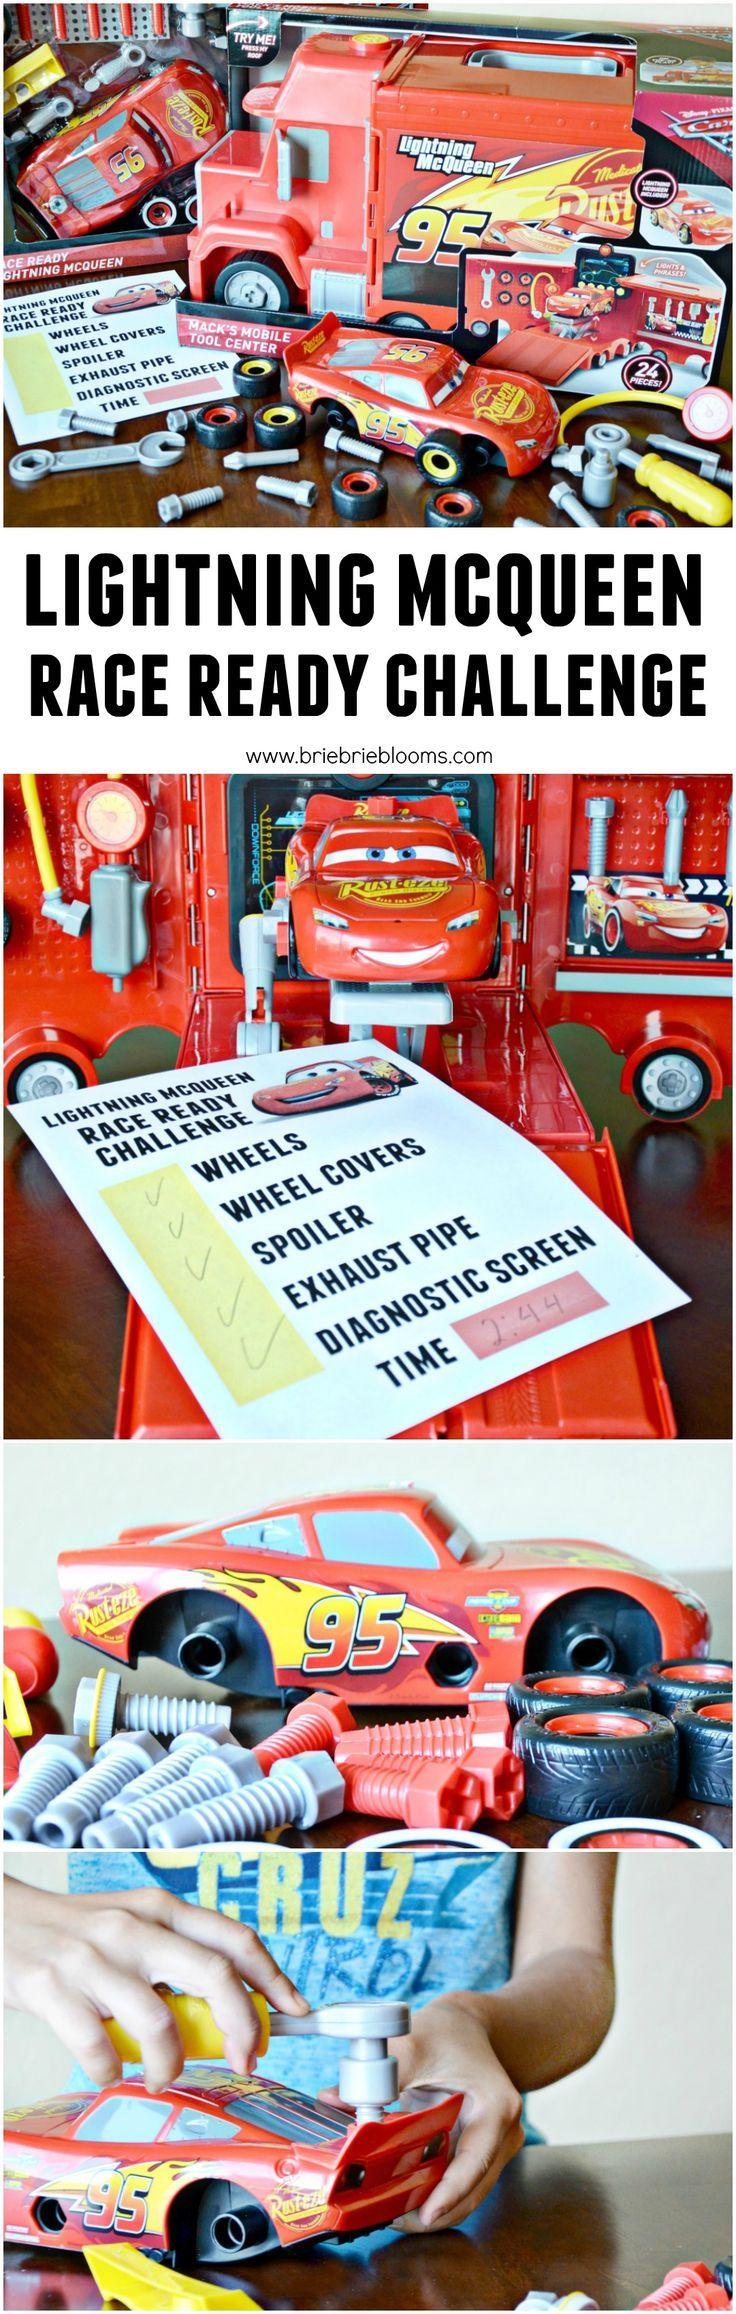 Best Disney Car Toys Images On Pinterest Diecast Disney - Lightning mcqueen custom vinyl decals for cardisney pixar cars a walk down cars advertising memory lane take